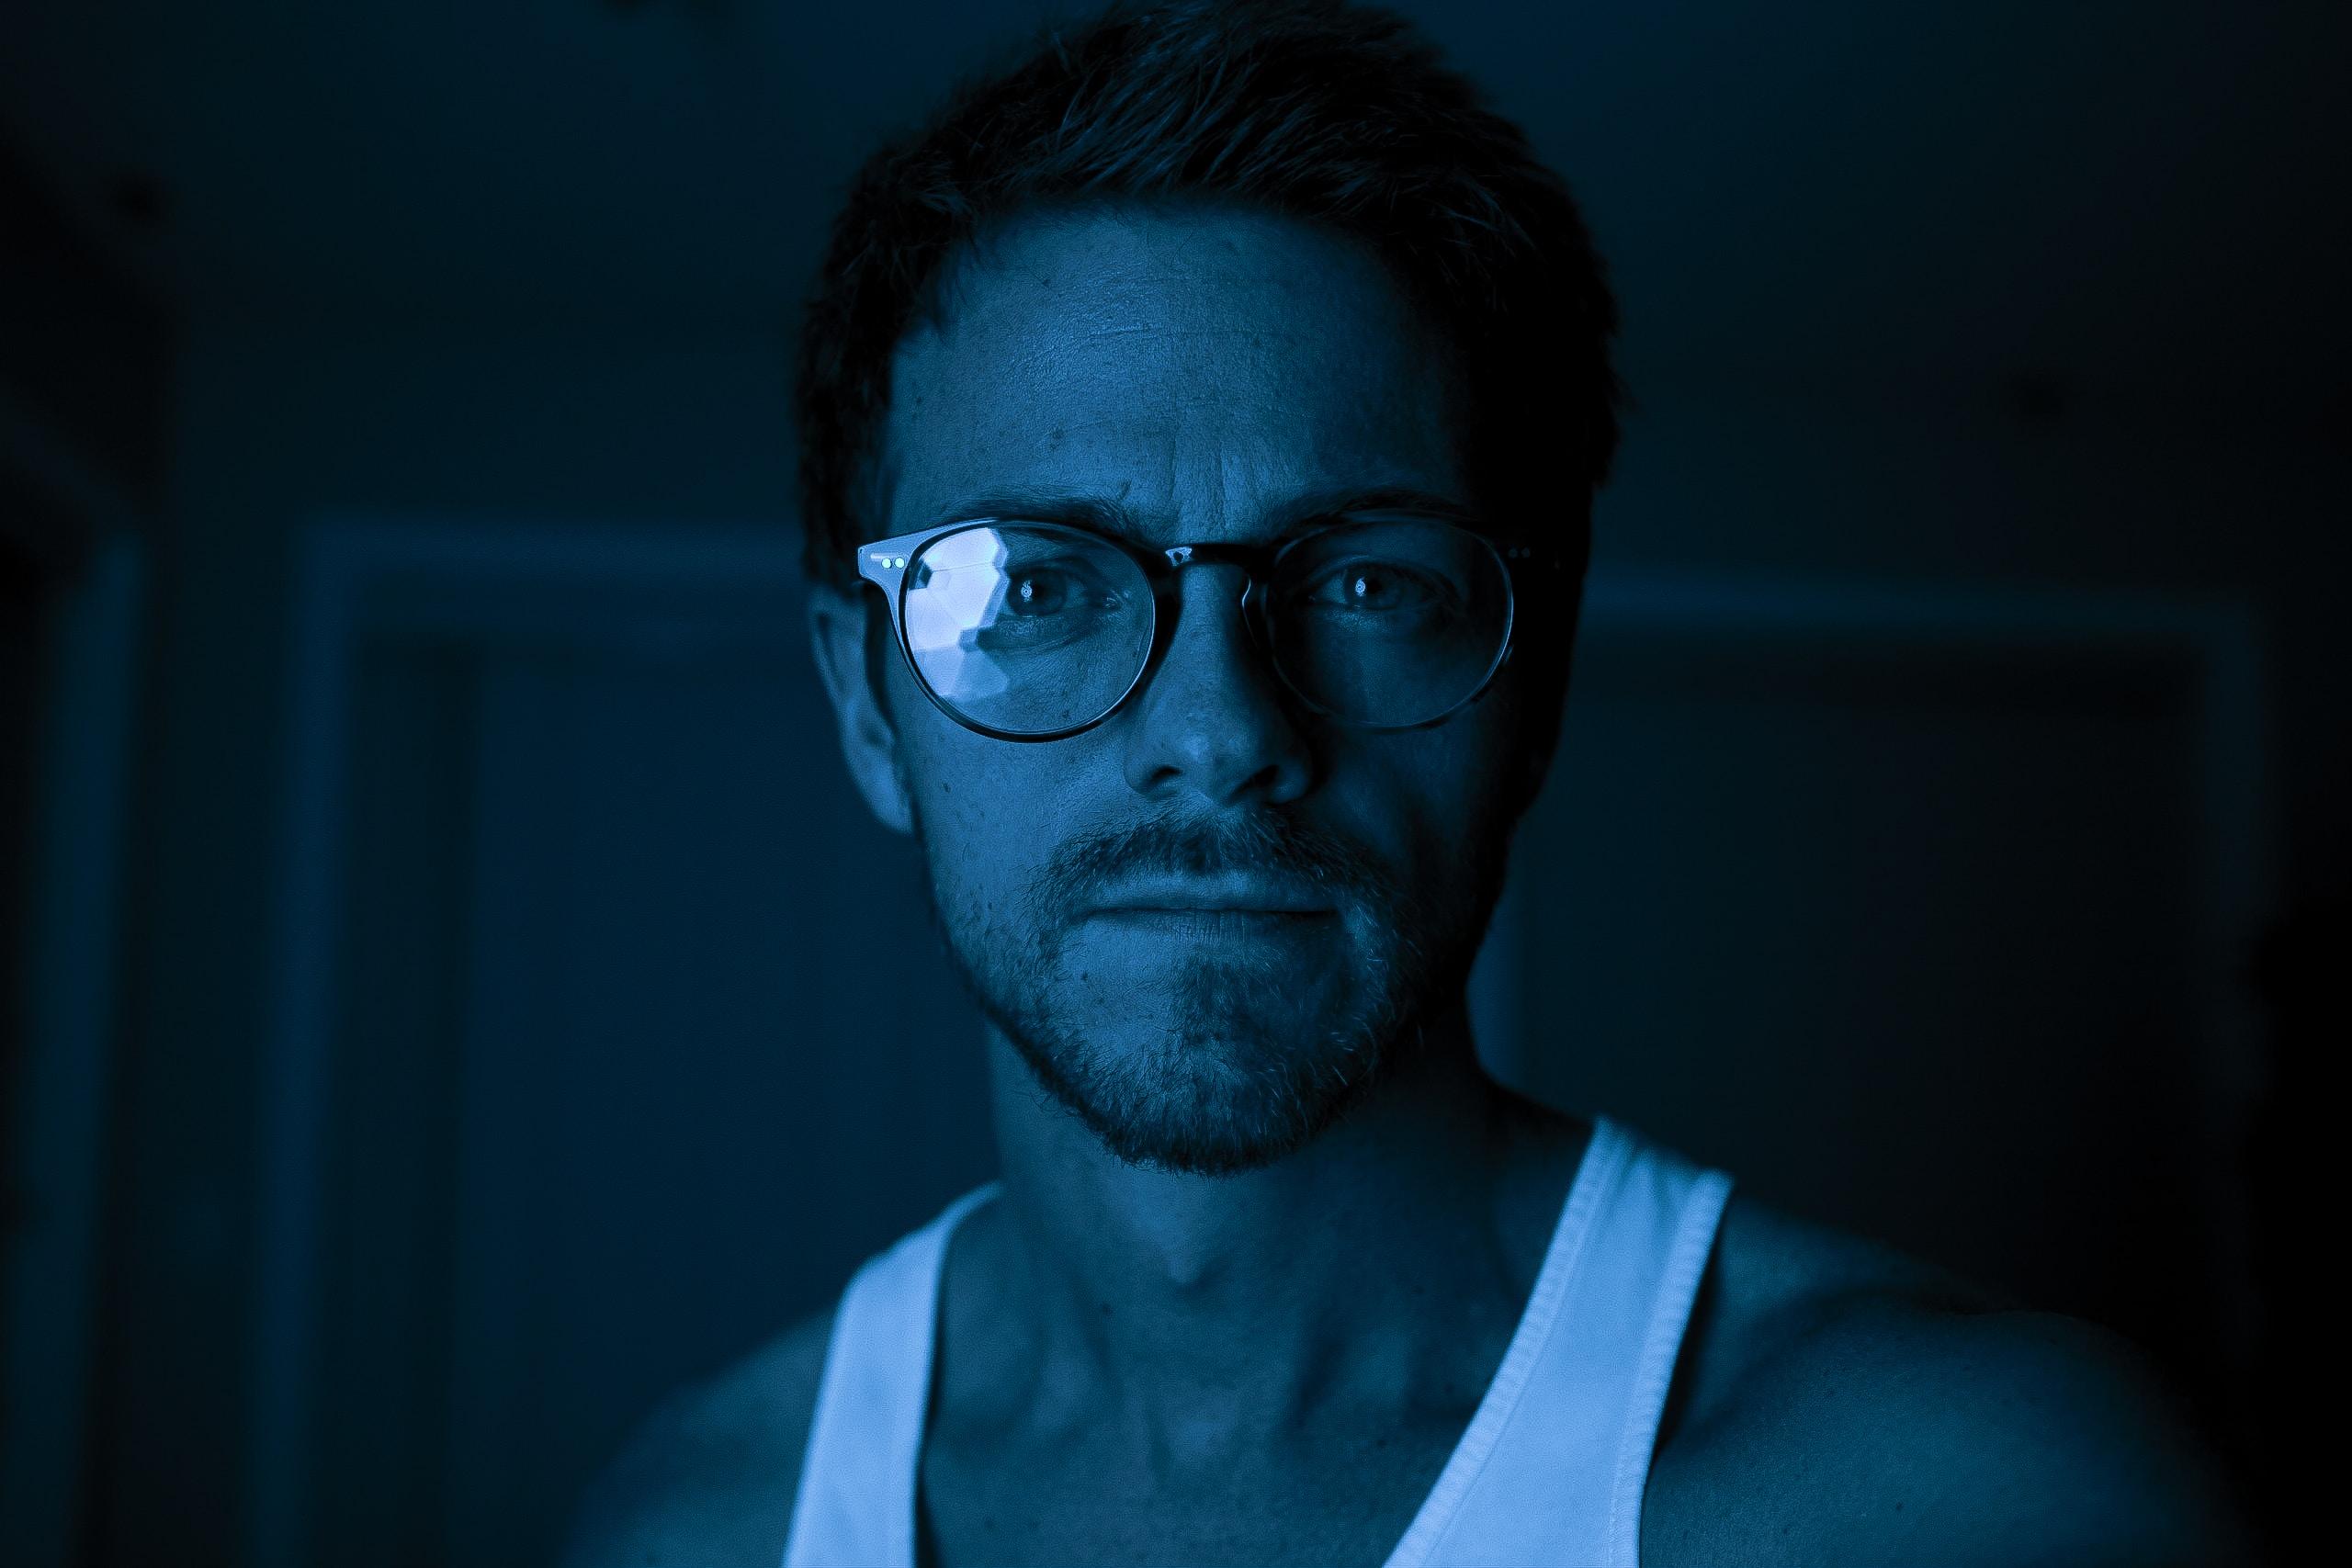 person wearing white top and black framed Wayfarer-style eyeglasses